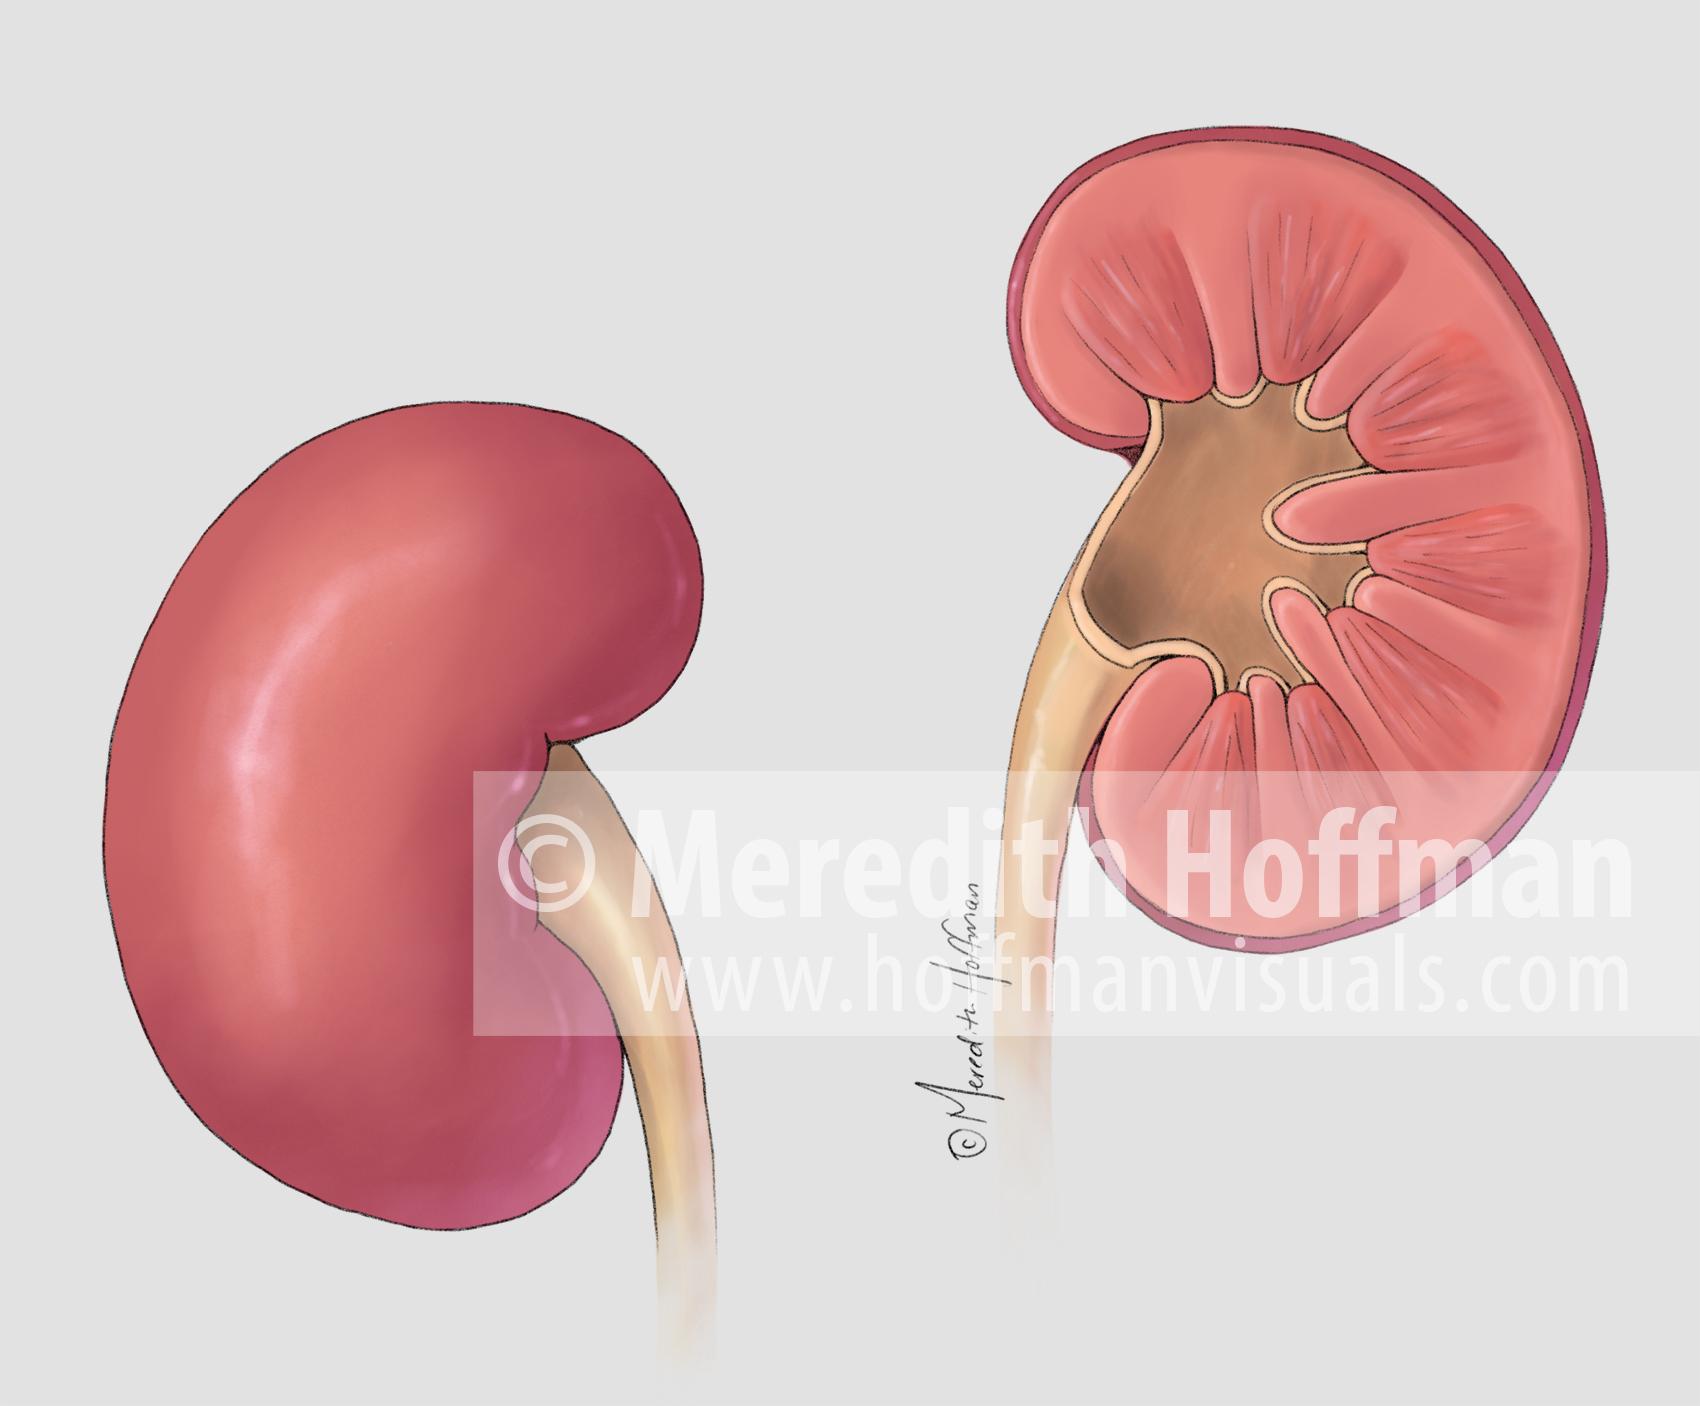 Anatomy of the kidneys